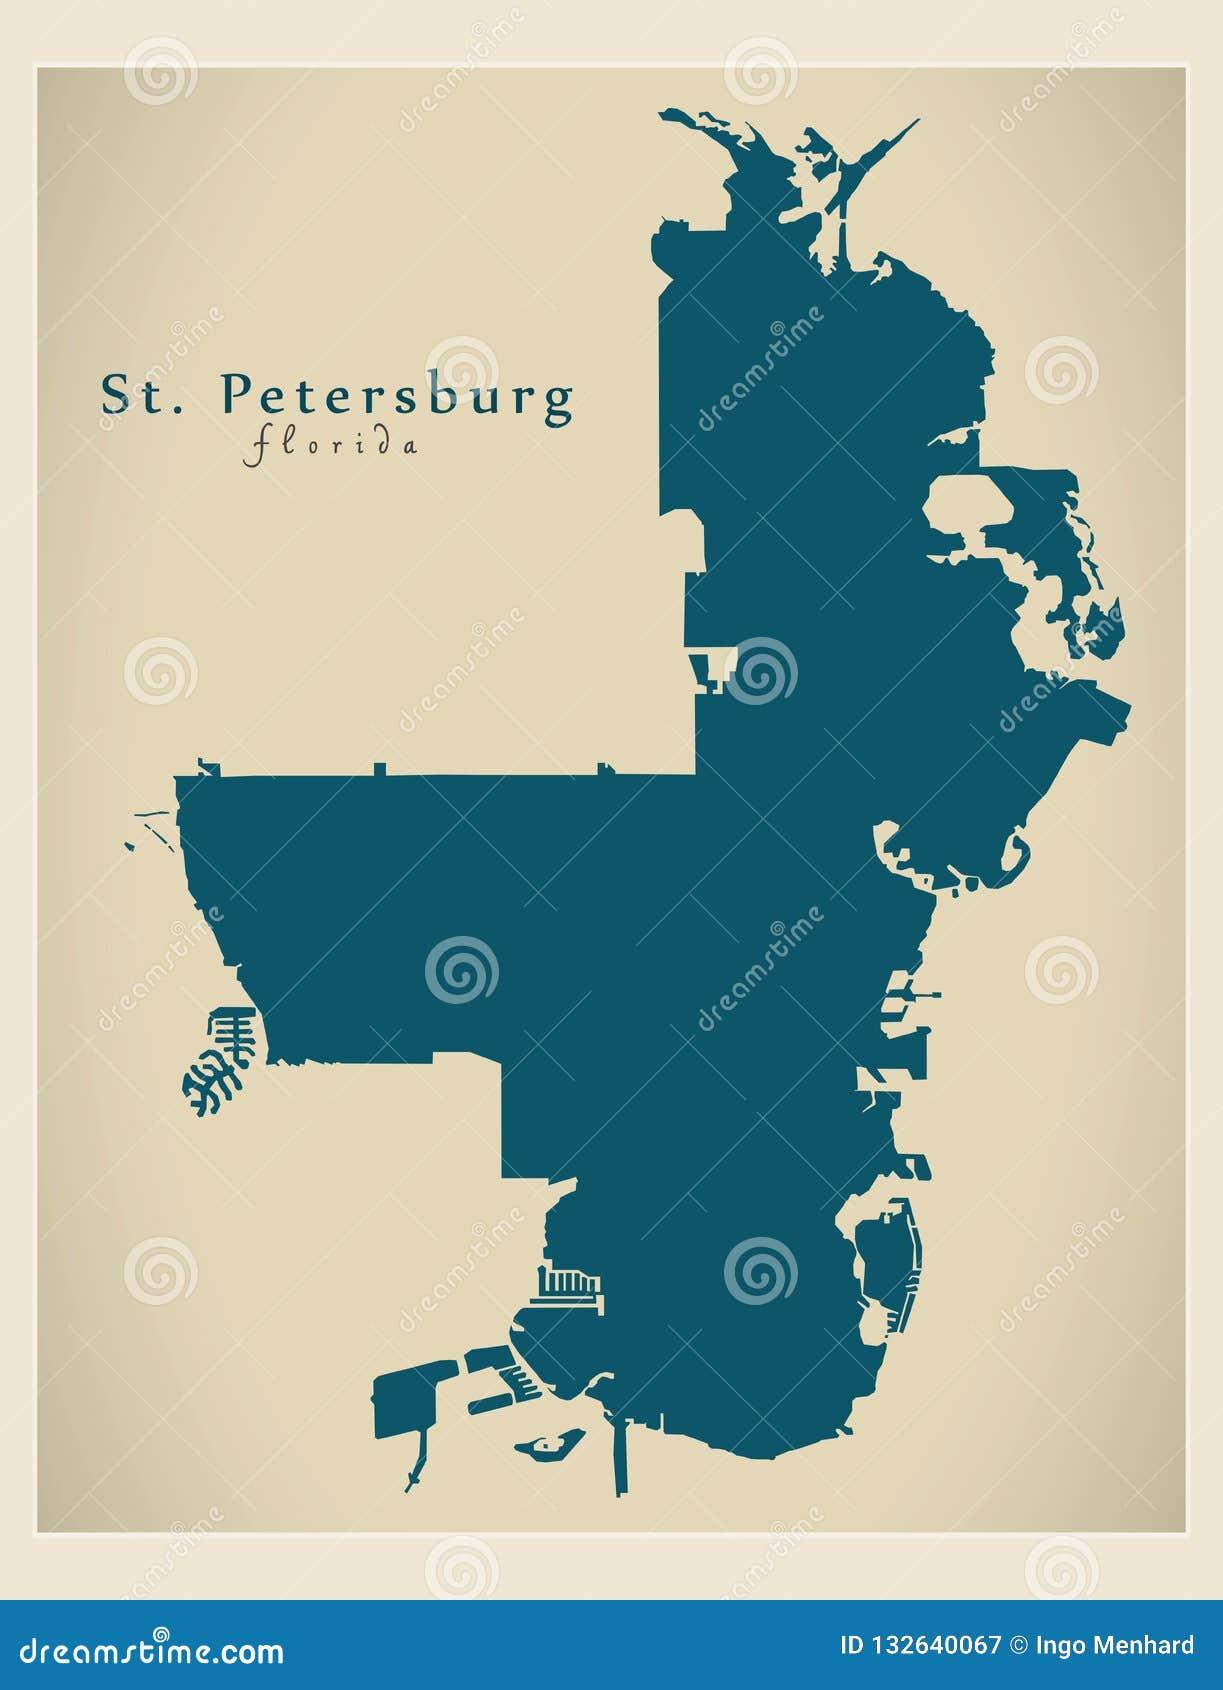 Map Of St Petersburg Florida.Modern City Map St Petersburg Florida City Of The Usa Stock